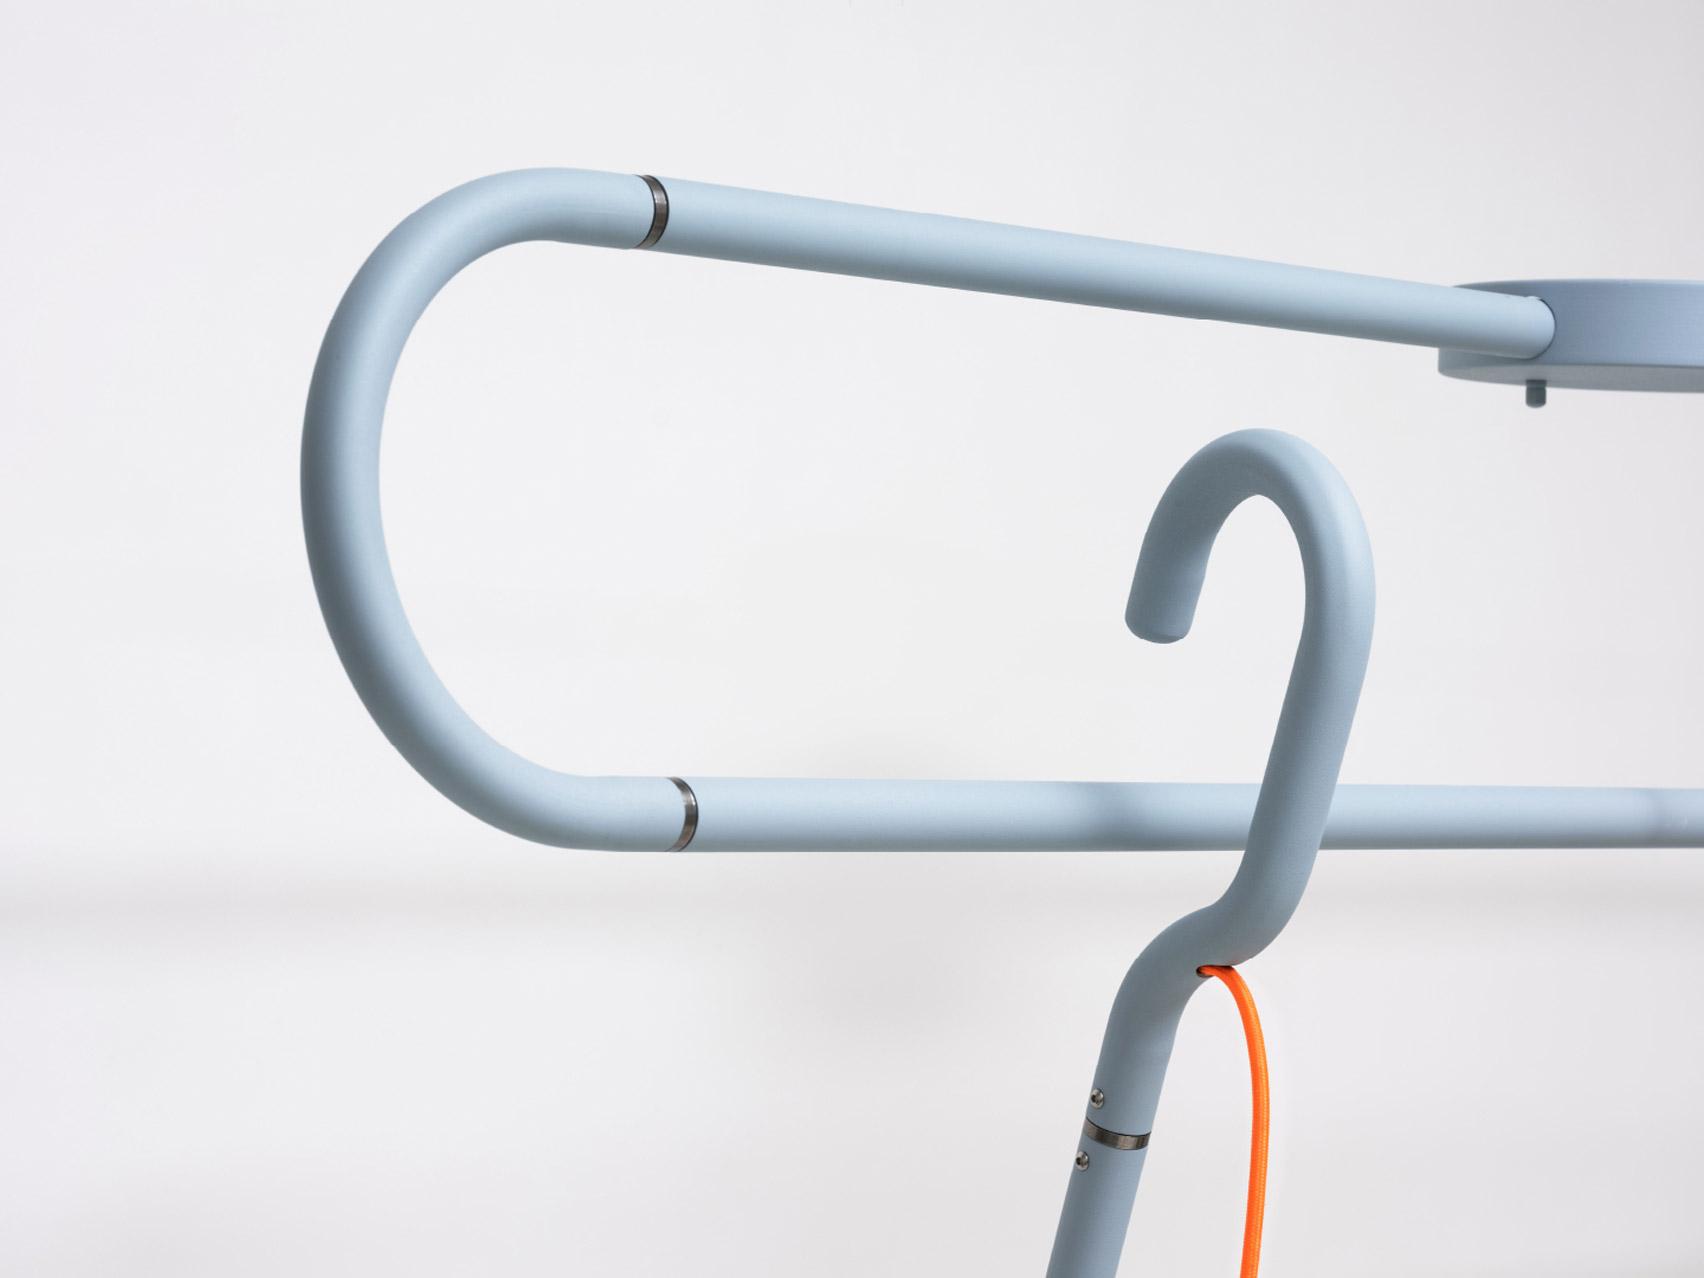 Bent steel creates a hook mechanism